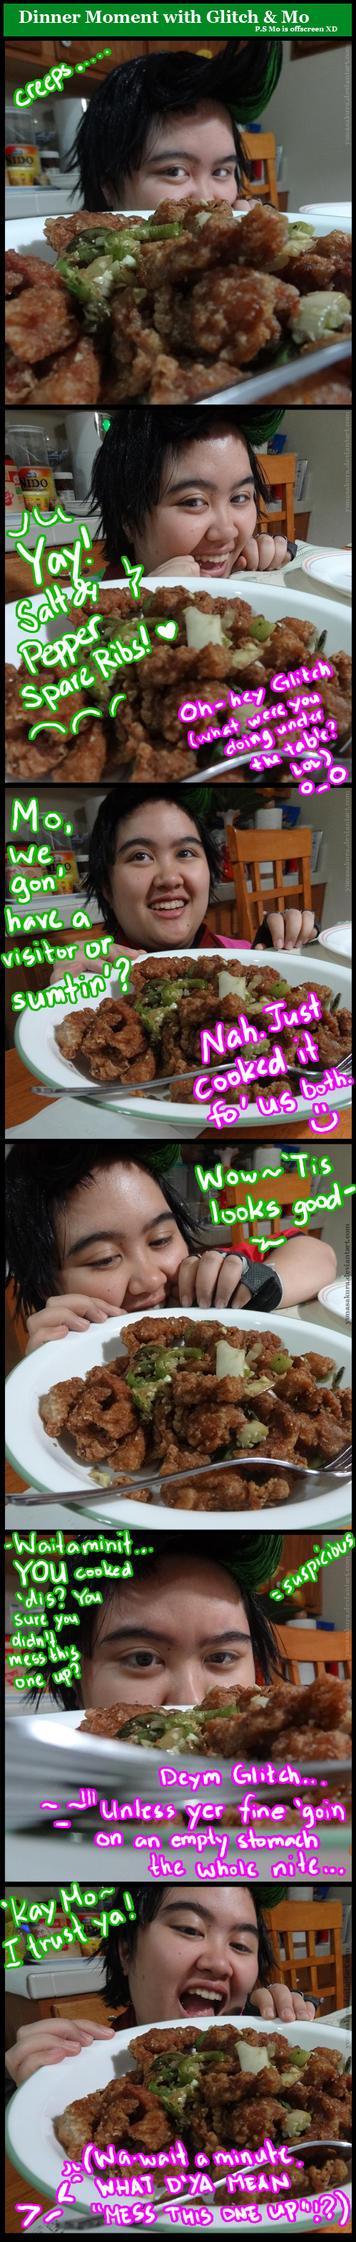 Random Dinner Moment with Mo and Glitch by YunaSakura